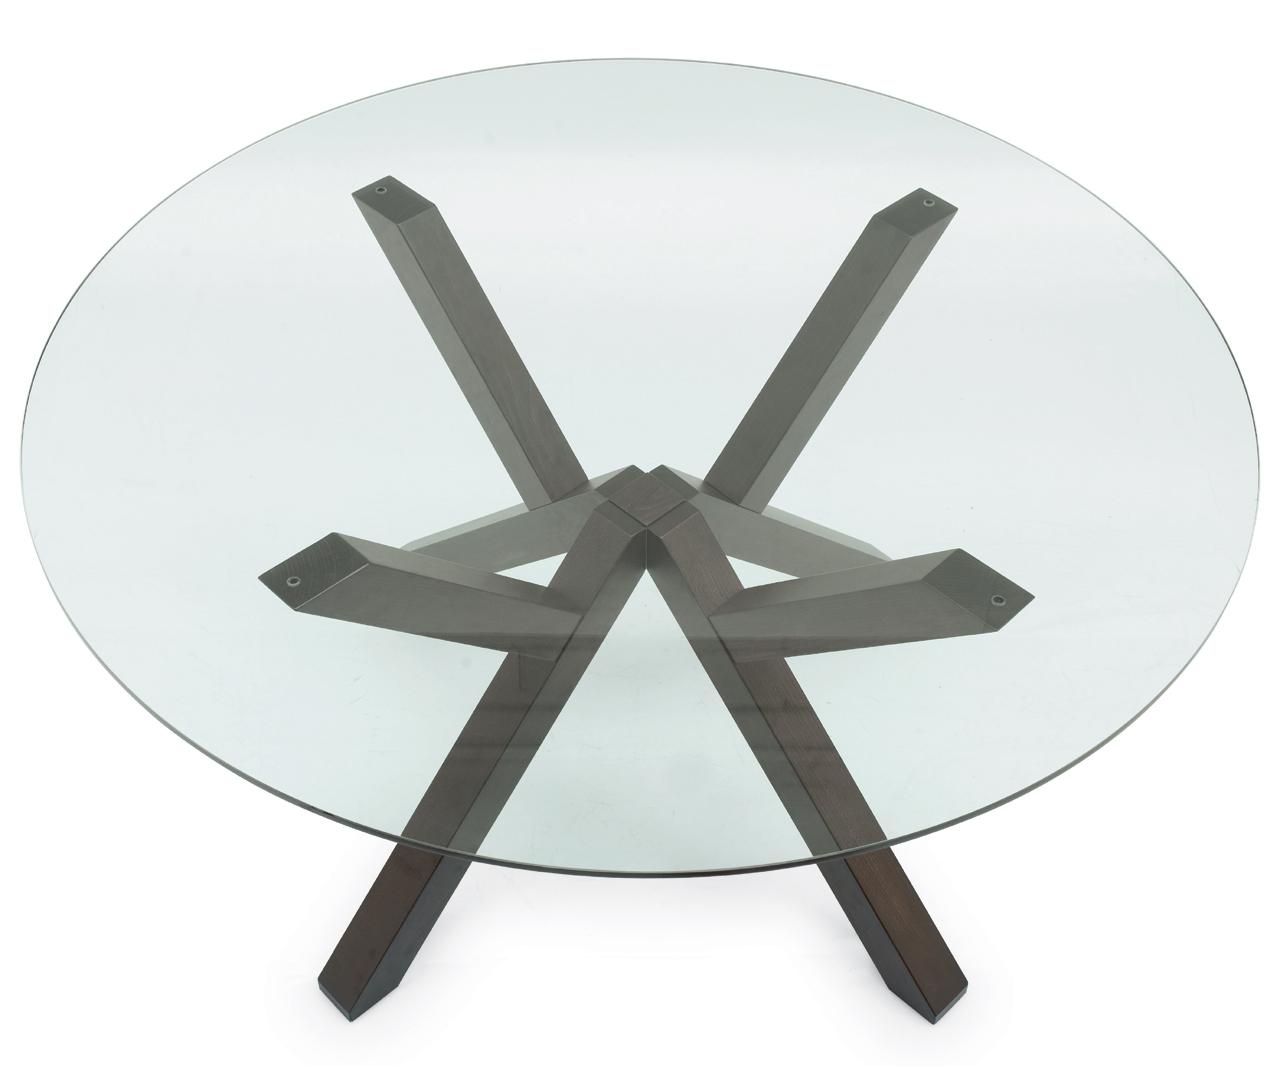 Table ronde plateau verre giulia meubles turone - Plateau verre pour table ronde ...